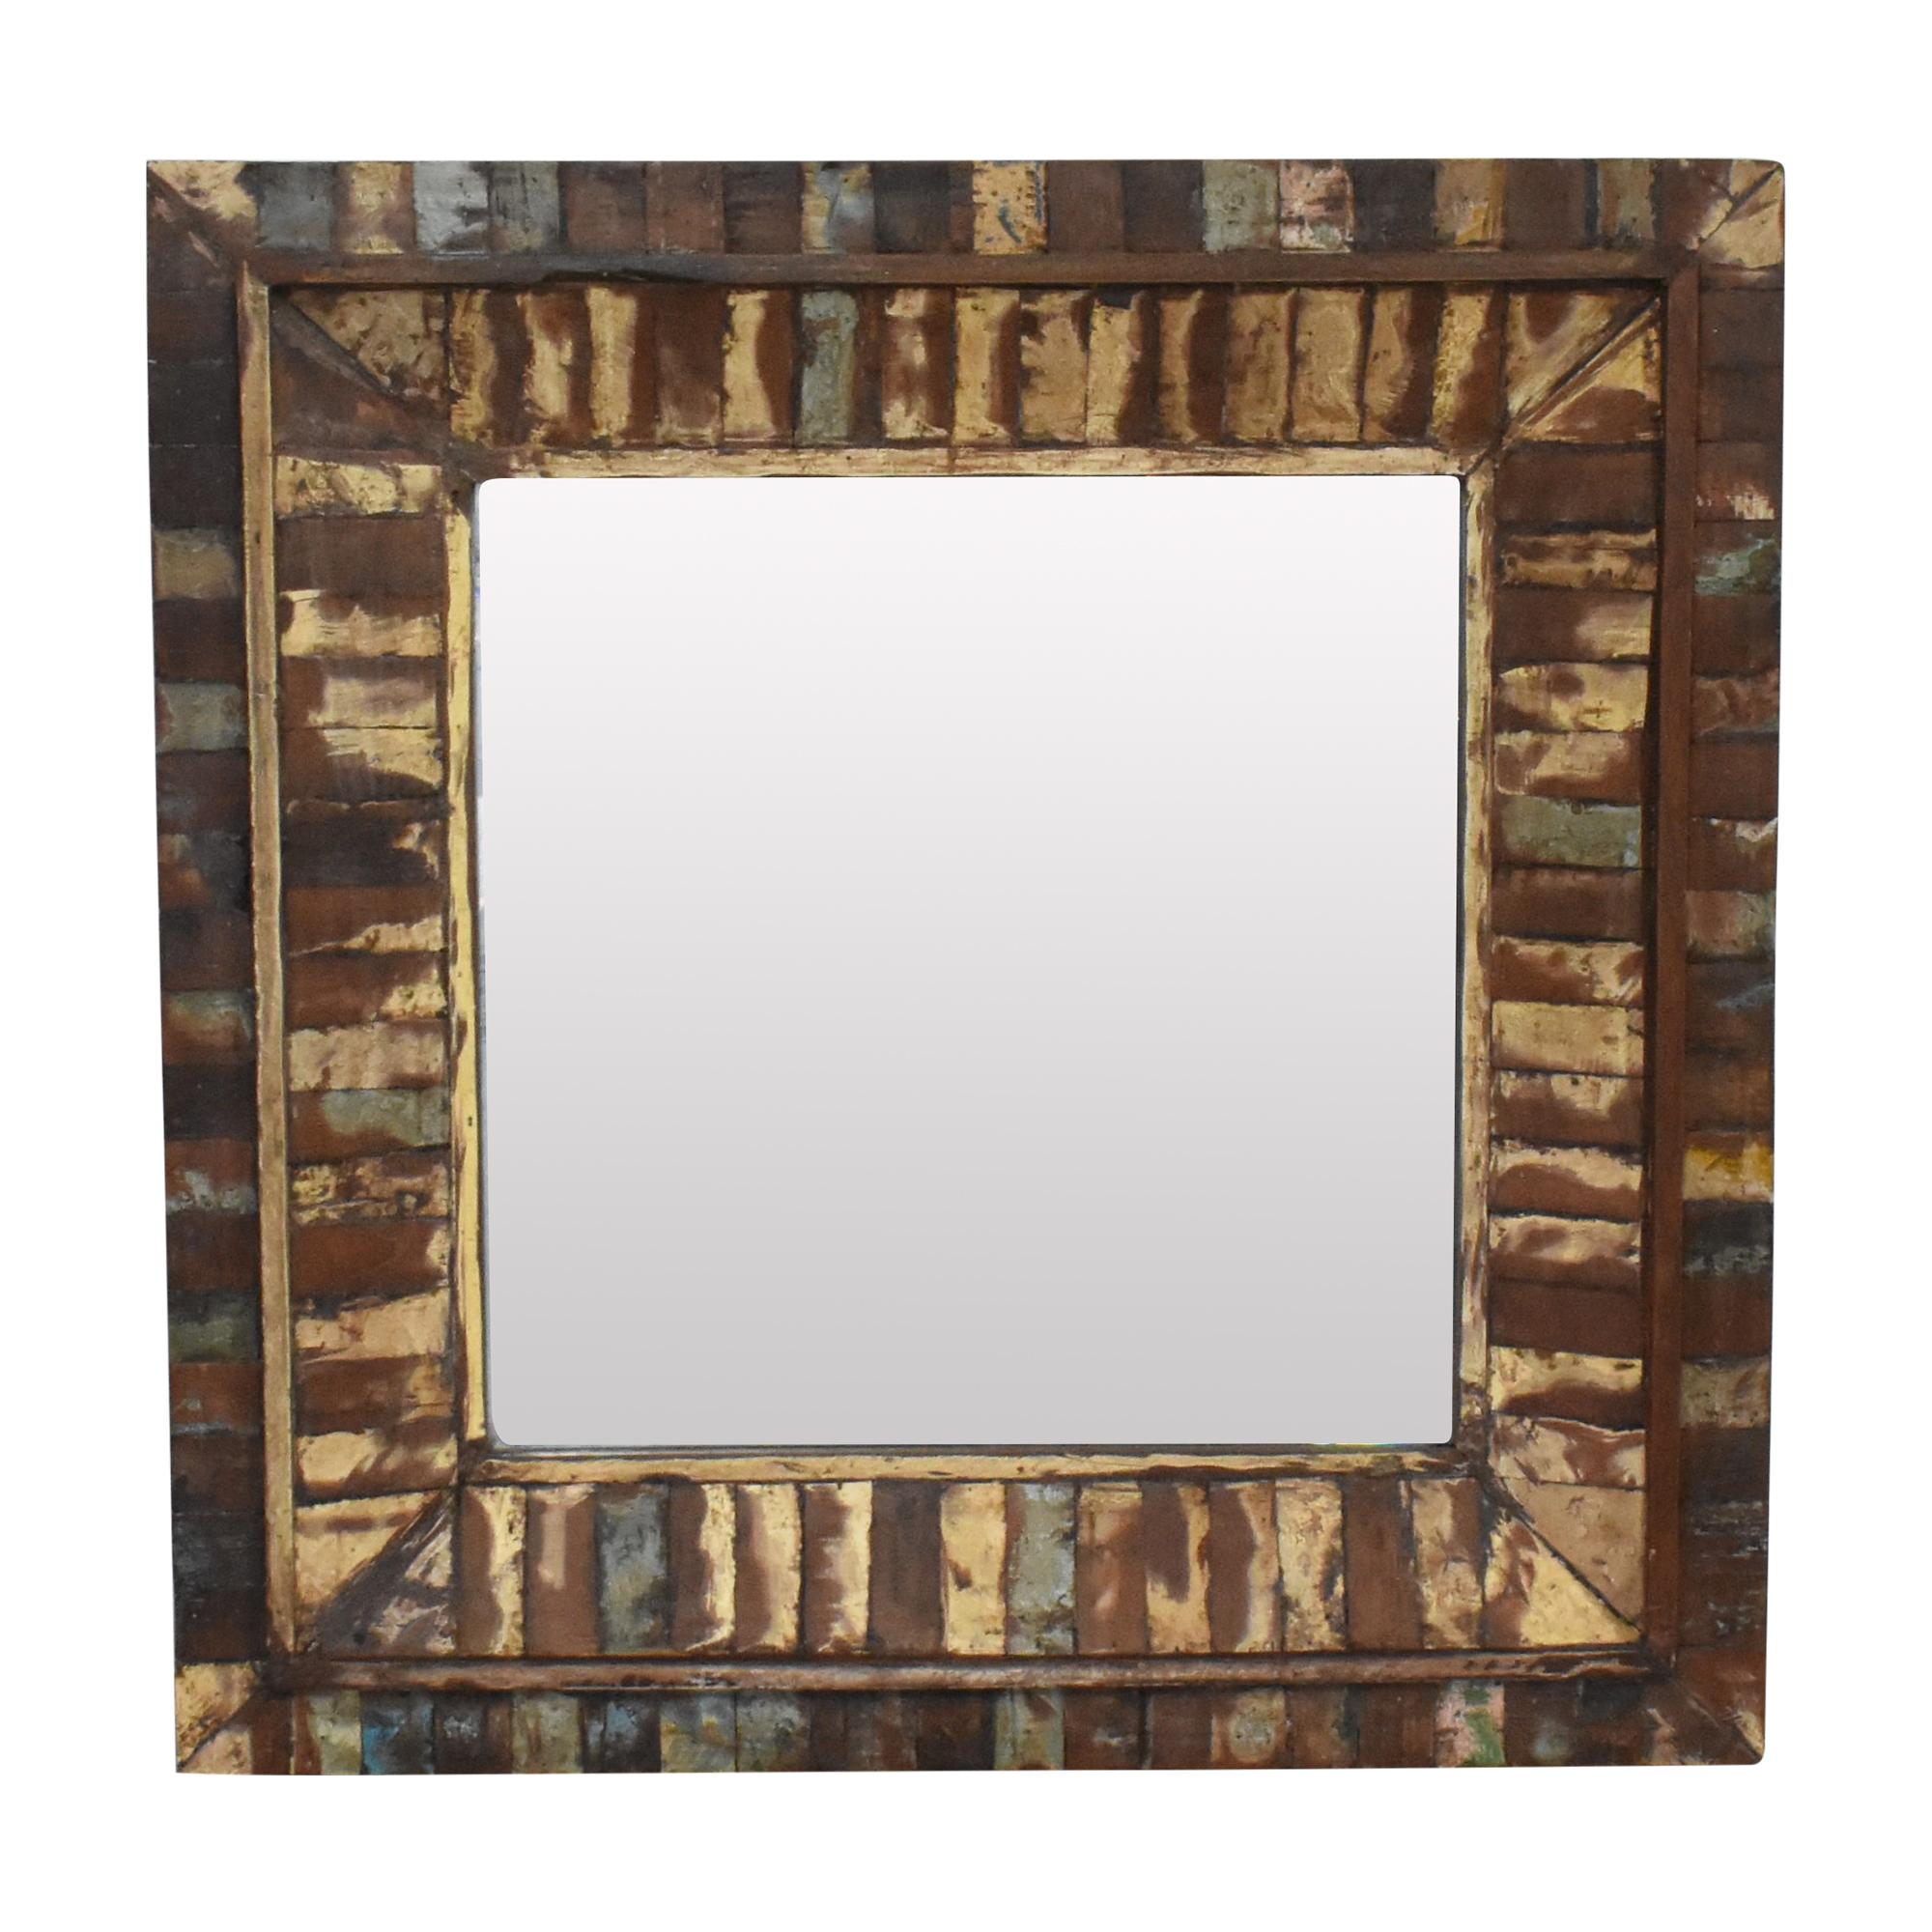 Rustic Framed Wall Mirror / Decor